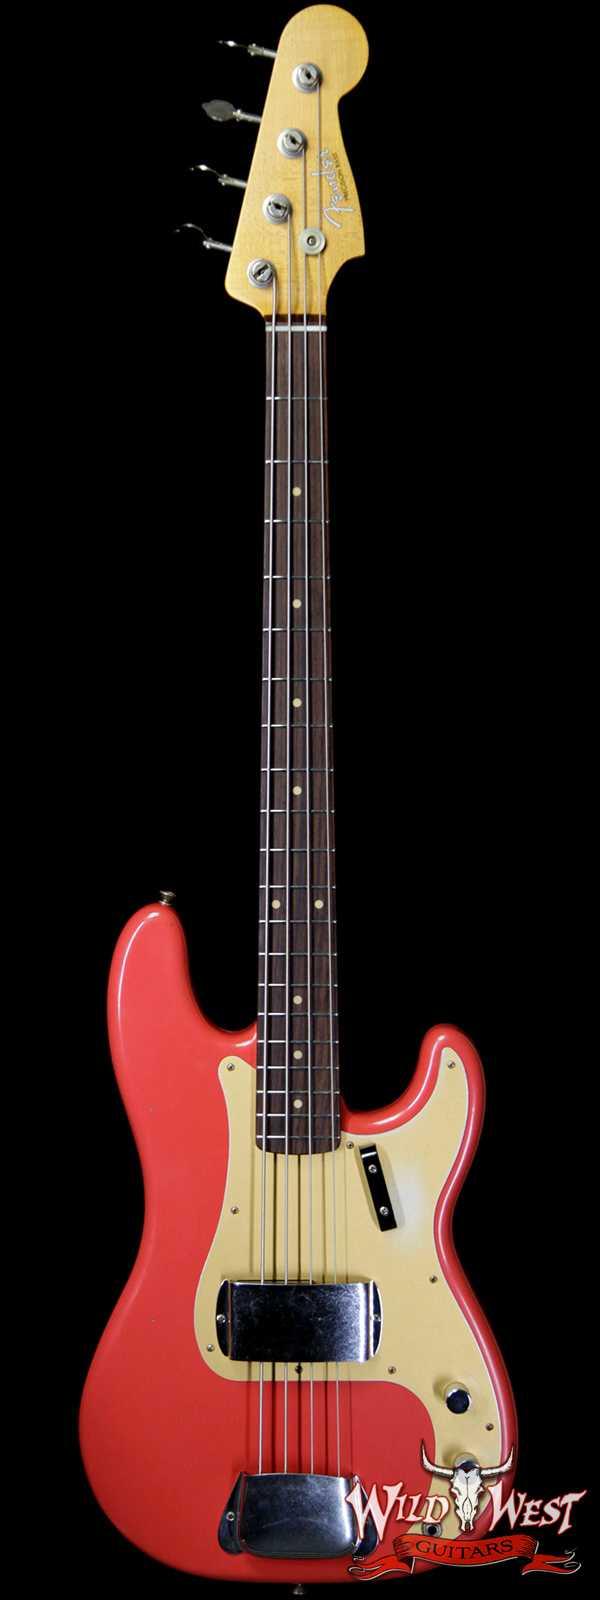 Fender Custom Shop 1959 Precision Bass Journeyman Relic AAA Rosewood Slab Board Josefina Hand-wound PU Fiesta Red